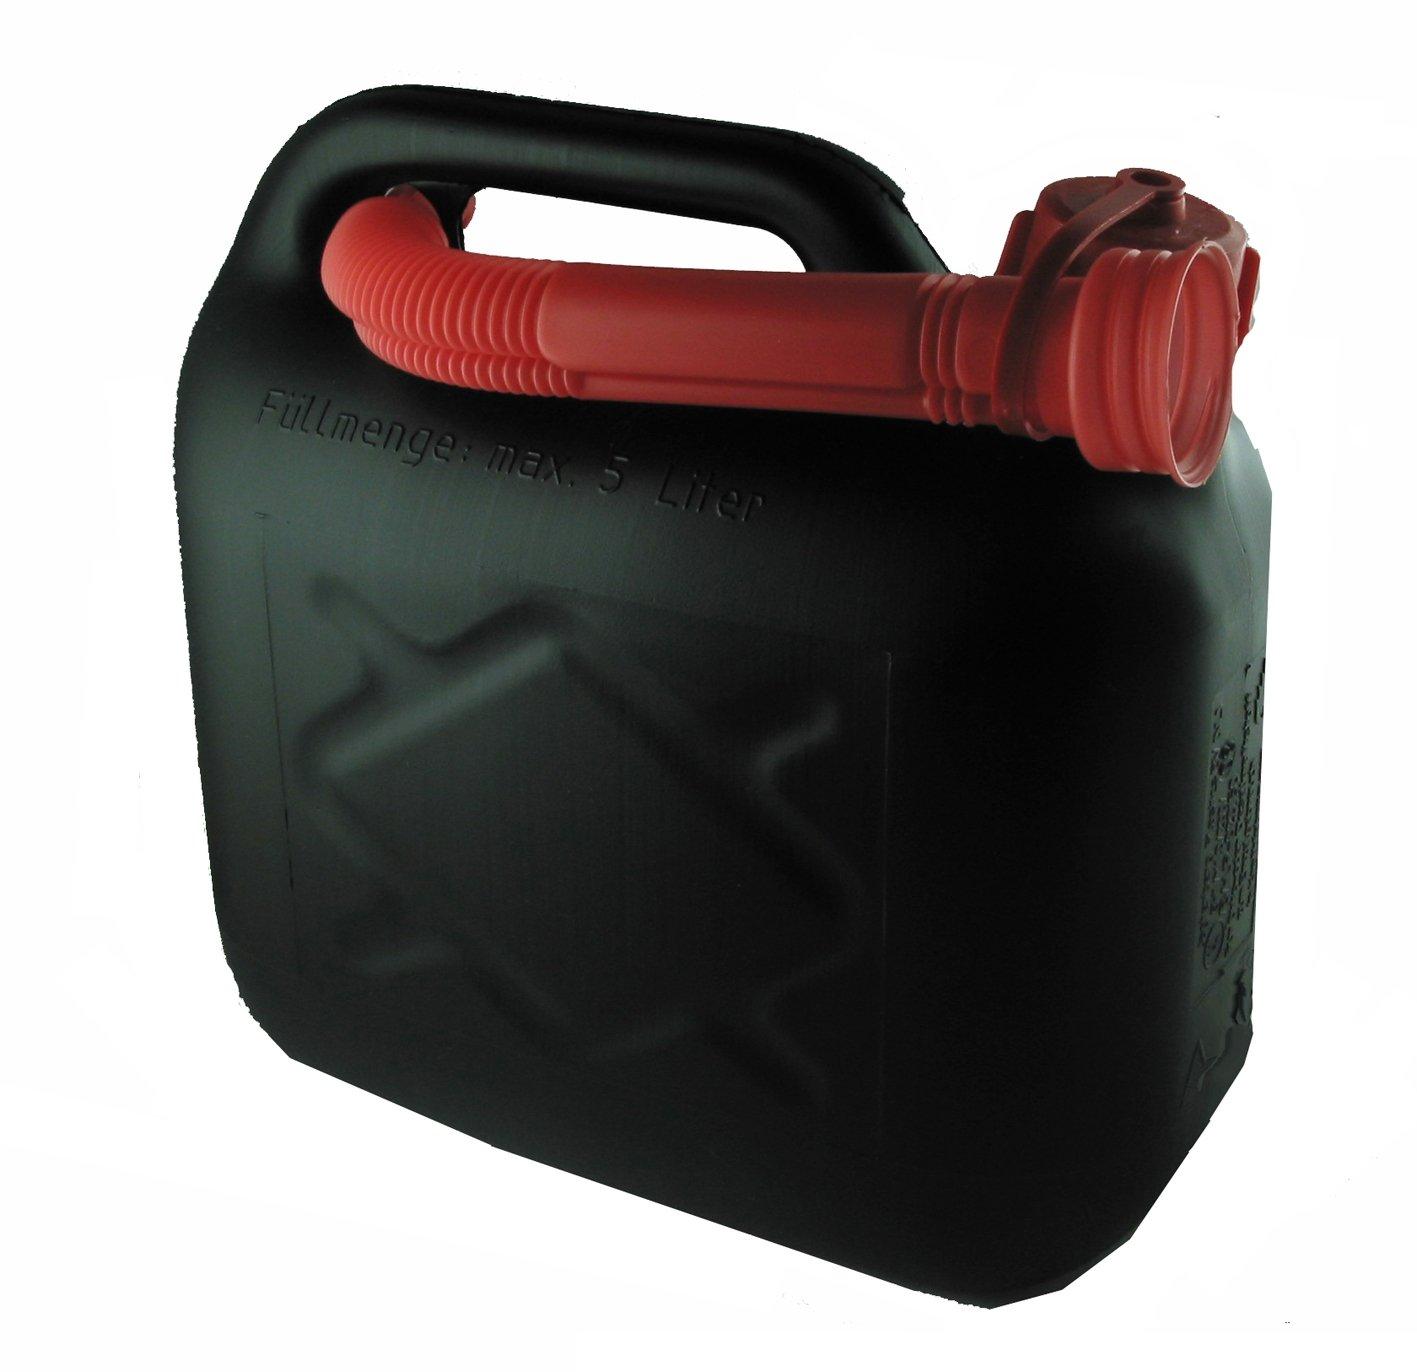 Neu Benzinkanister 5 Liter Benzin & Diesel: Amazon.de: Auto KT45